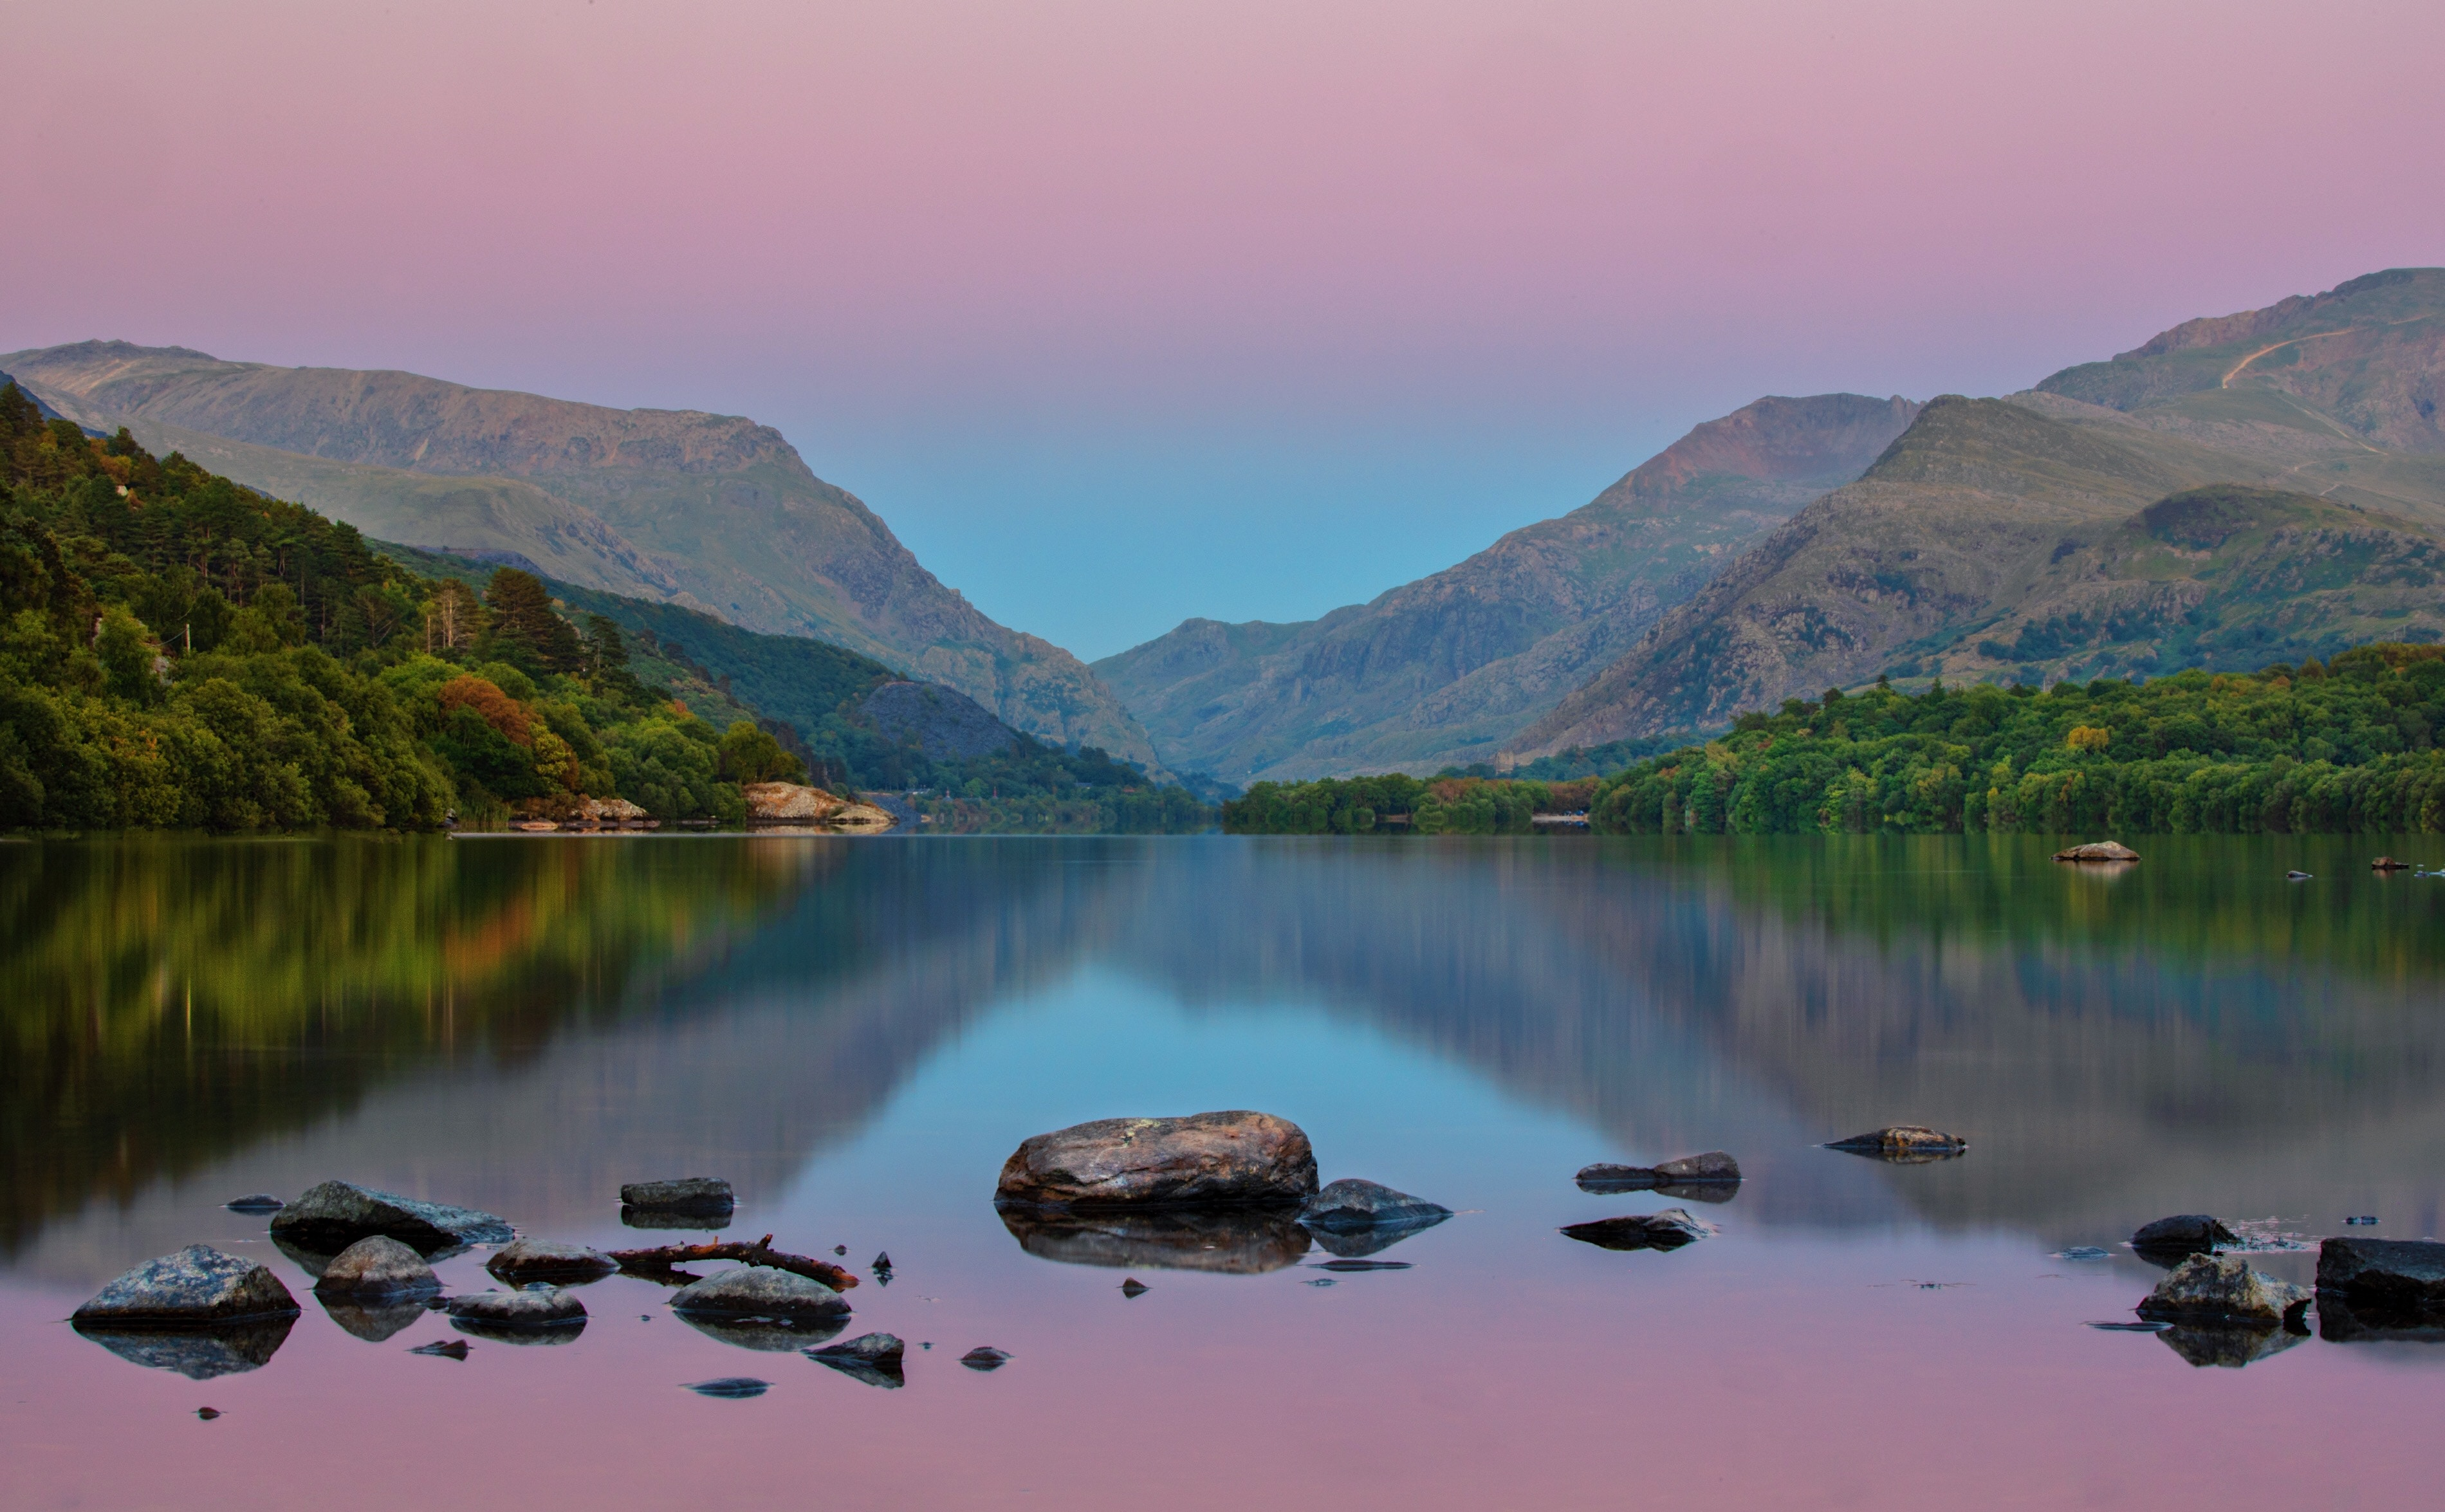 Lake Mountain Reflection Minimalism Wallpapers Hd: Mountain Lake Water Still Reflection 4k, HD Nature, 4k